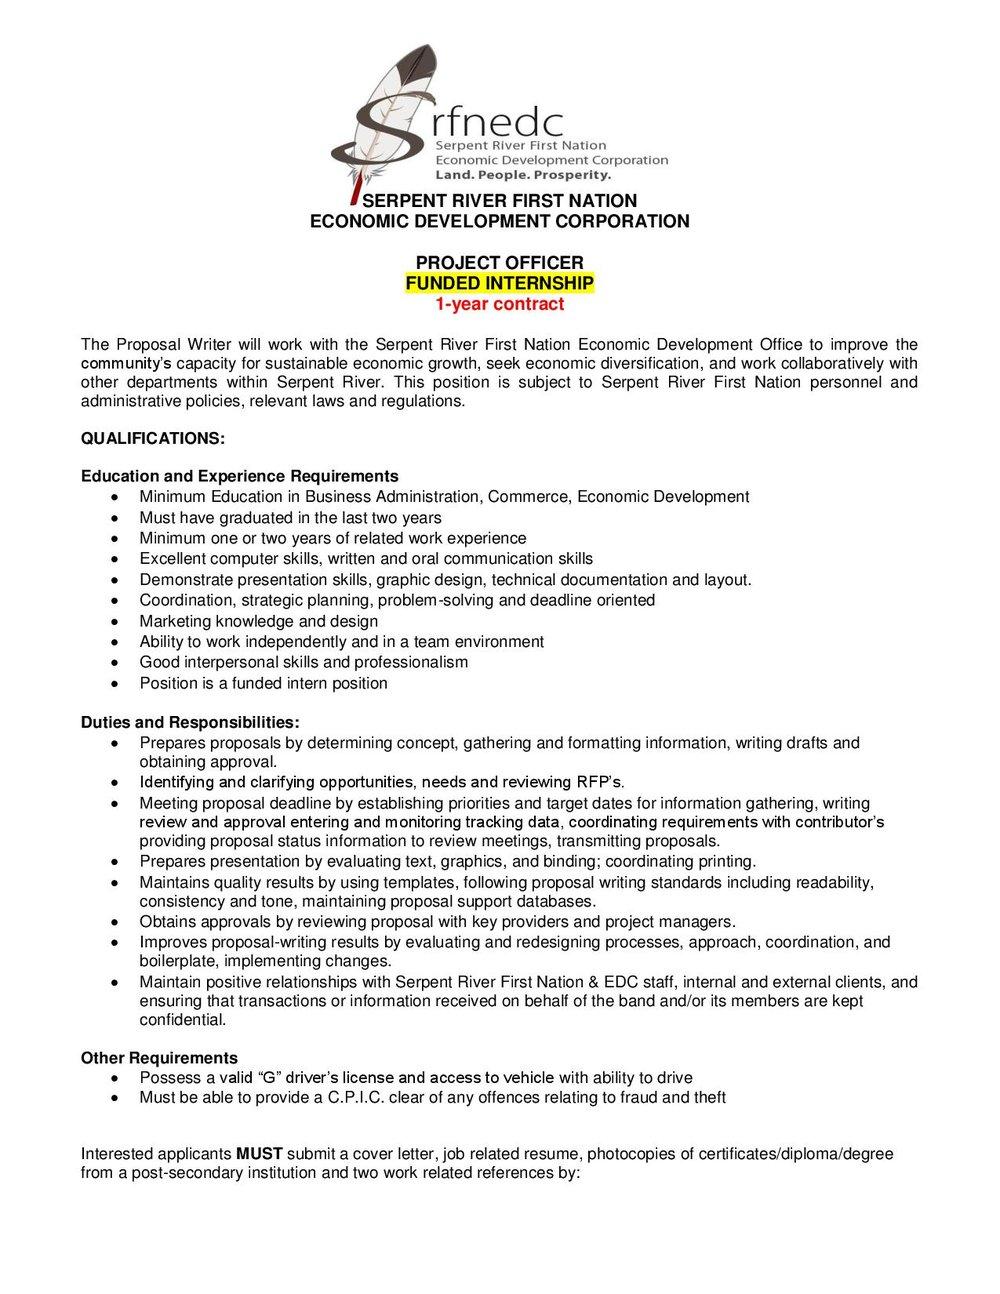 Project Officer - SRFNEDC JOB POSTING 2019-page-001.jpg